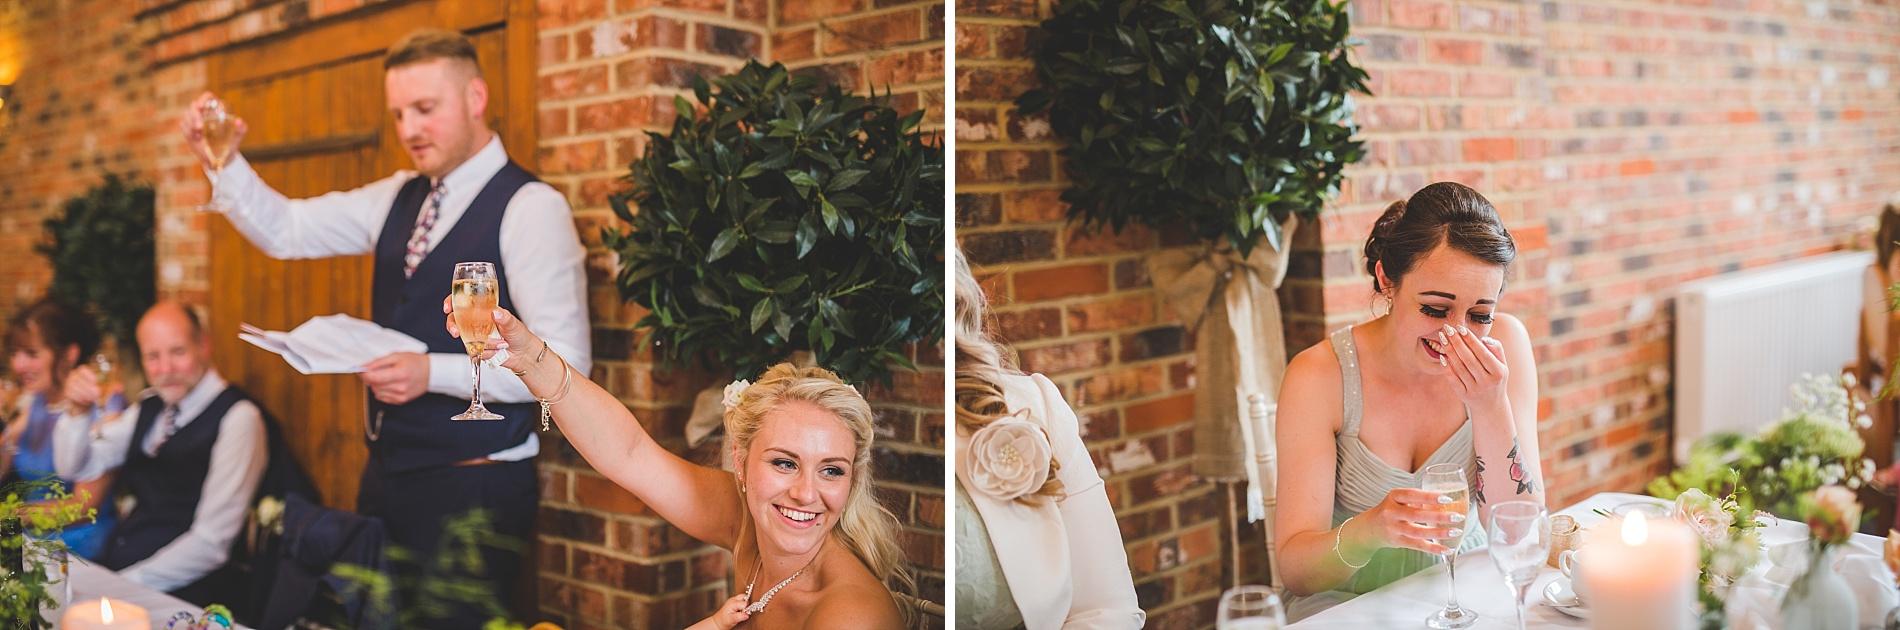 hall farm wedding photography (64)